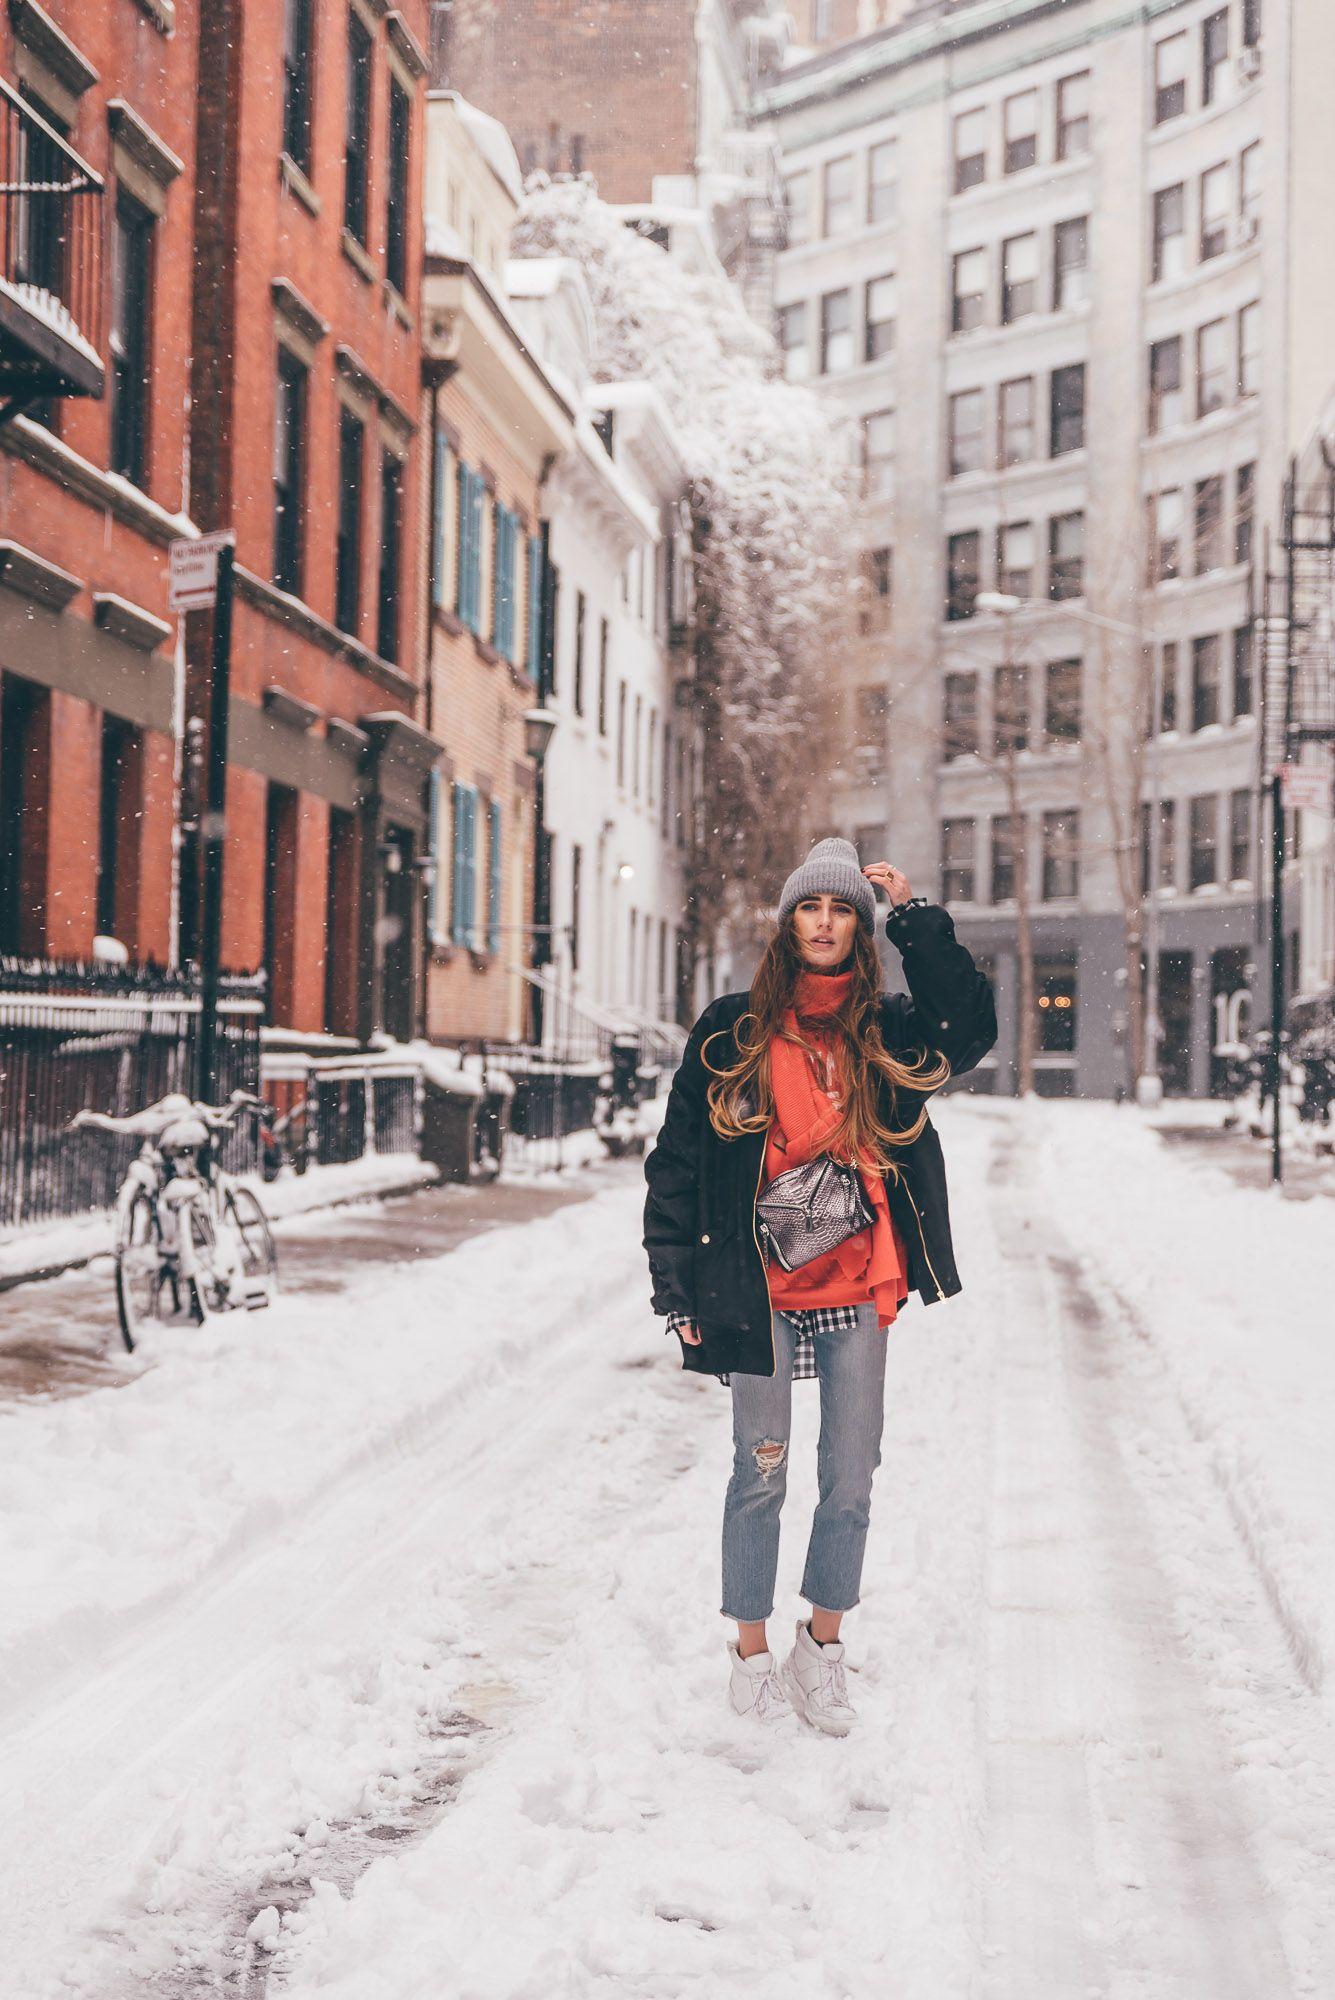 New York City Snow Storm Magic Lisa Fiege New York Winter Outfit Nyc Winter Outfits New York Winter Fashion